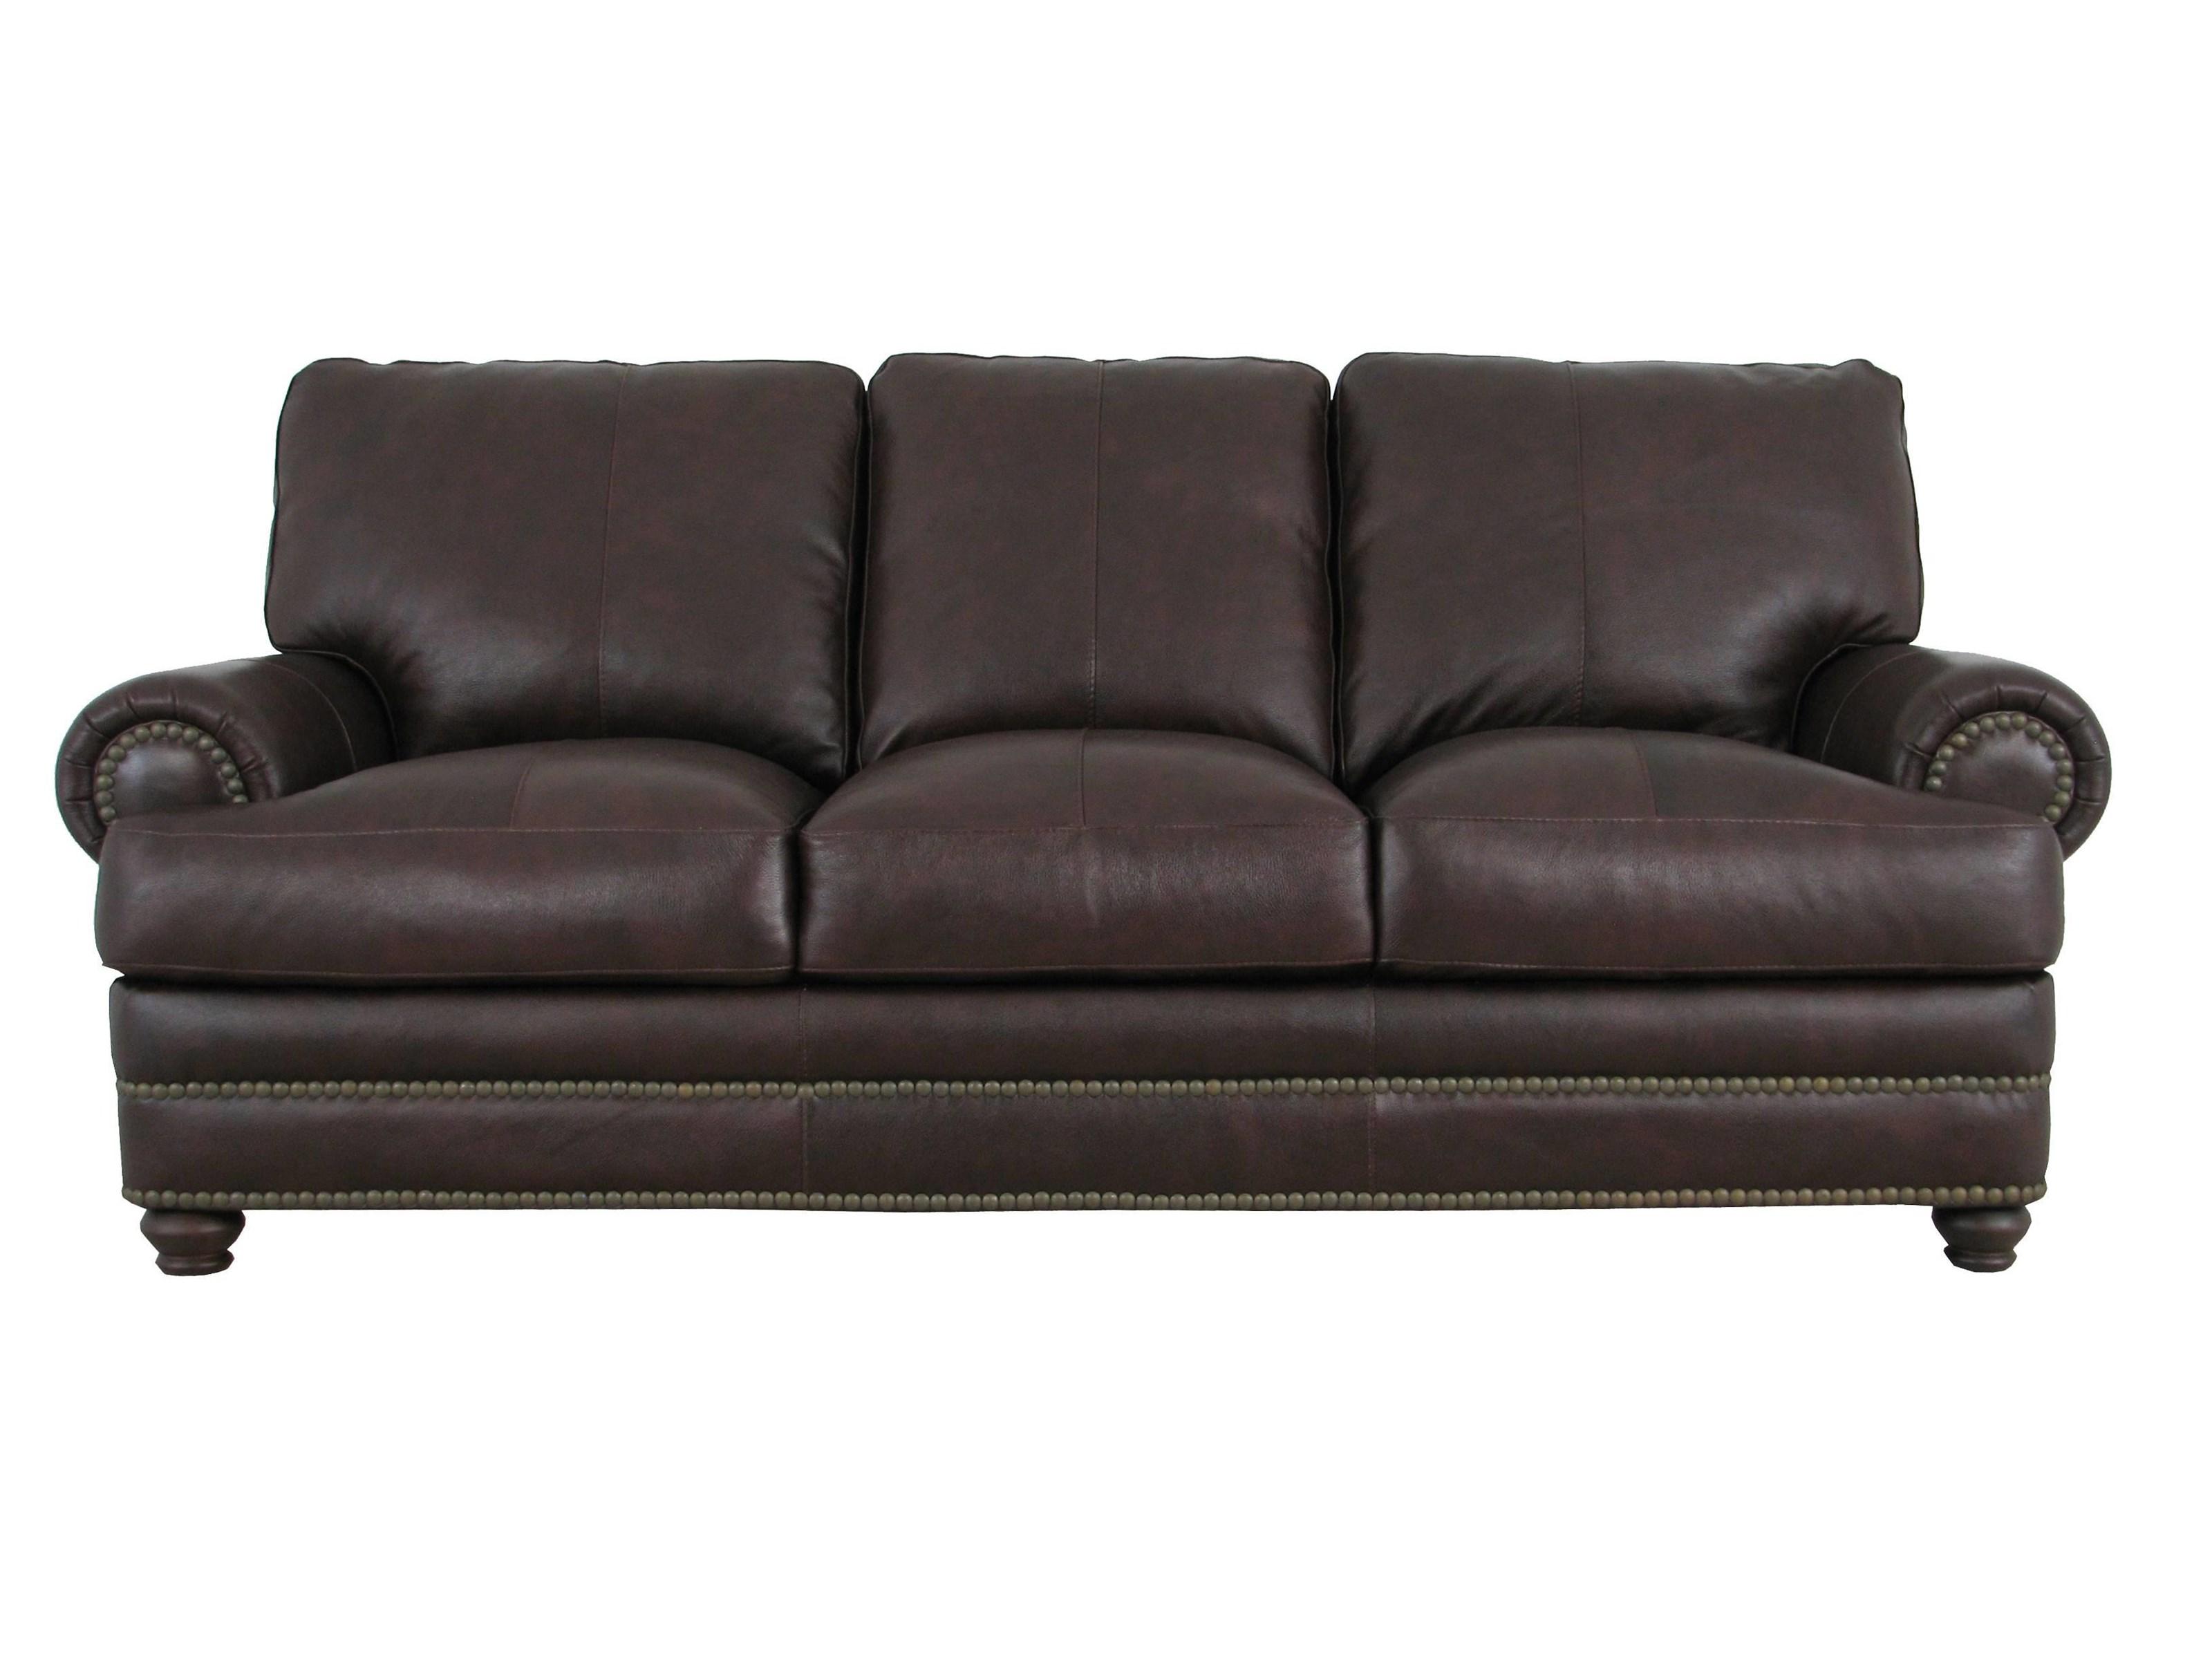 Soft Line 7103 Leather Sofa - Item Number: 7103Sofa